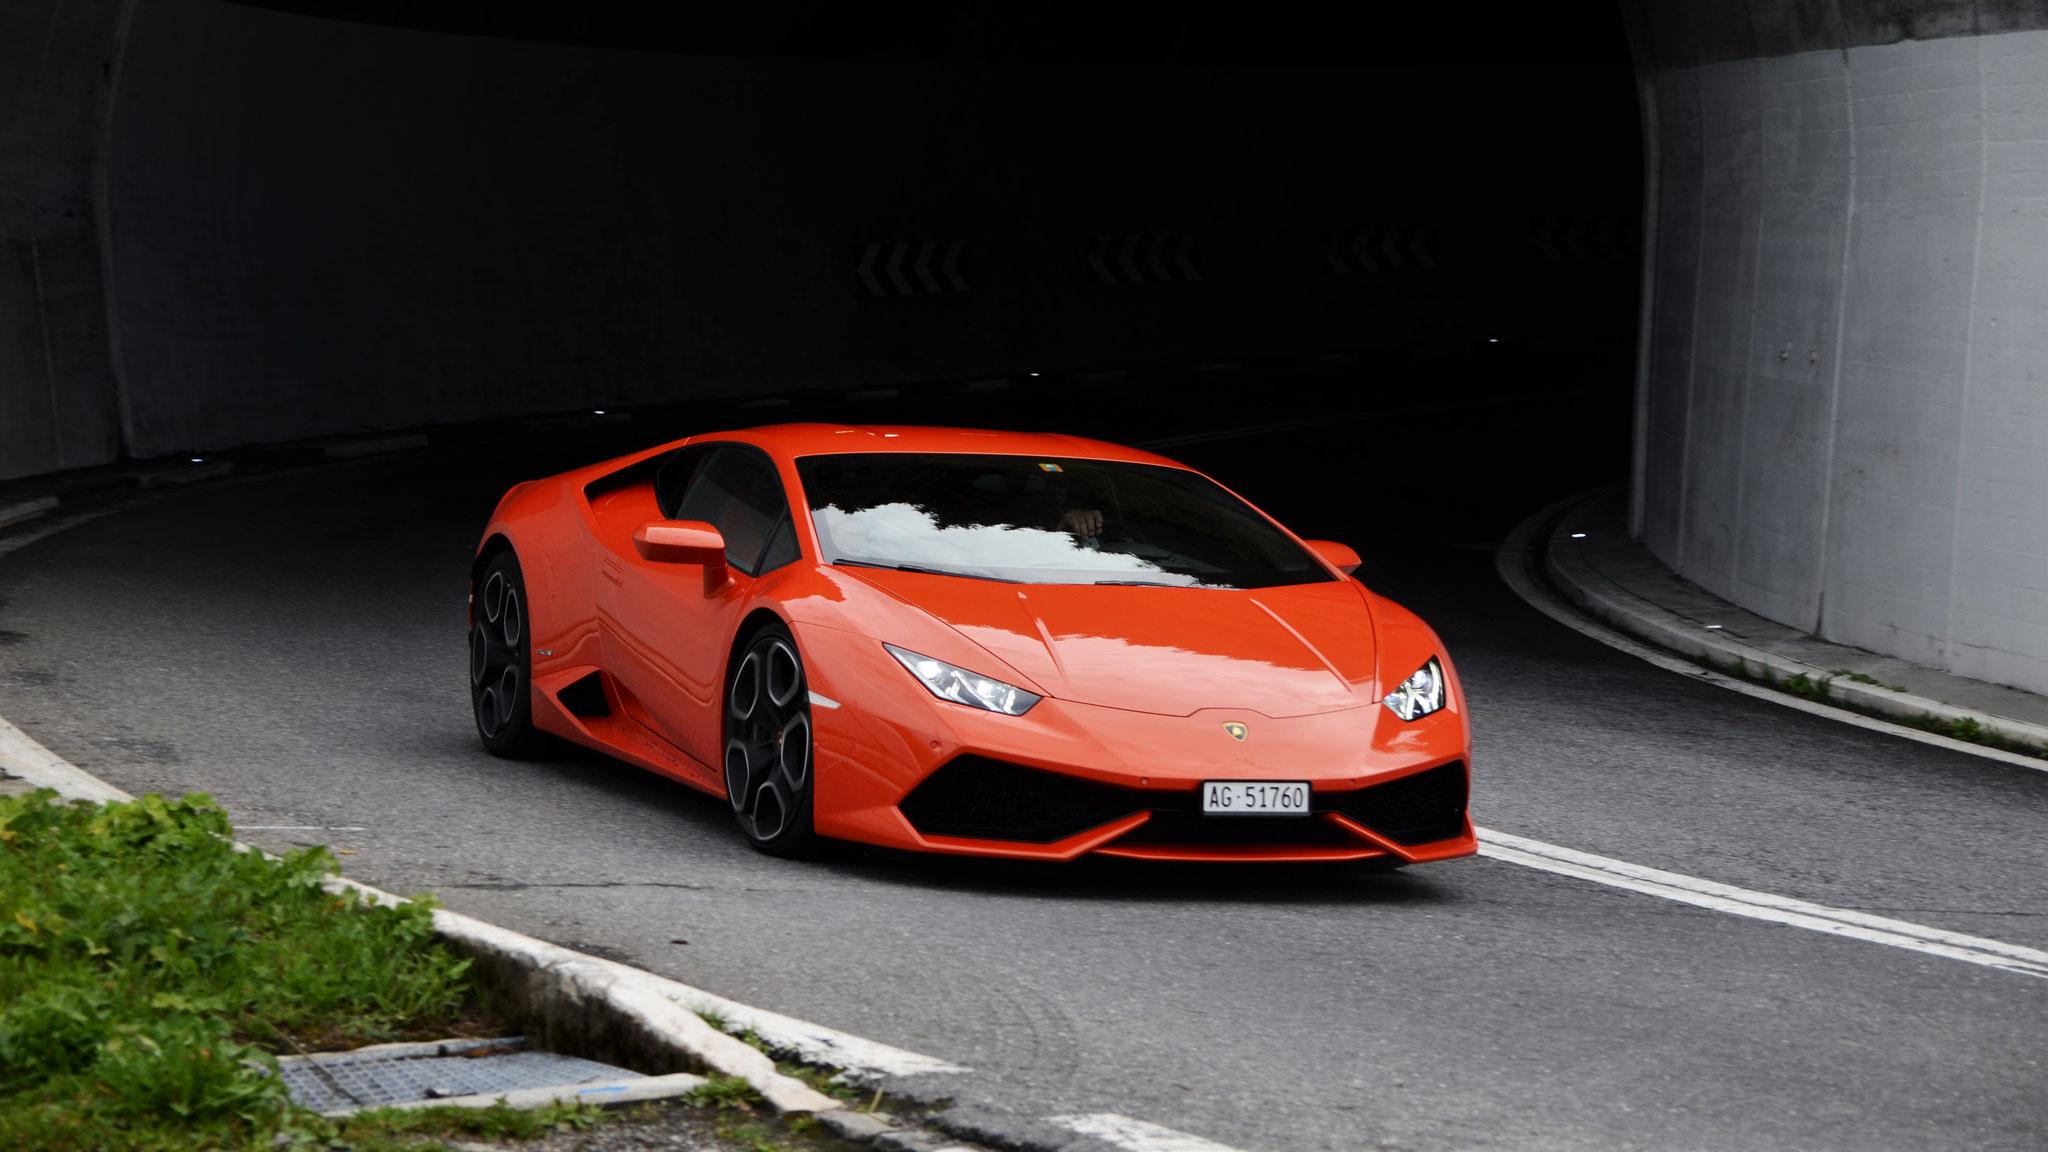 Lamborghini Huracan - AG-51760 (CH)